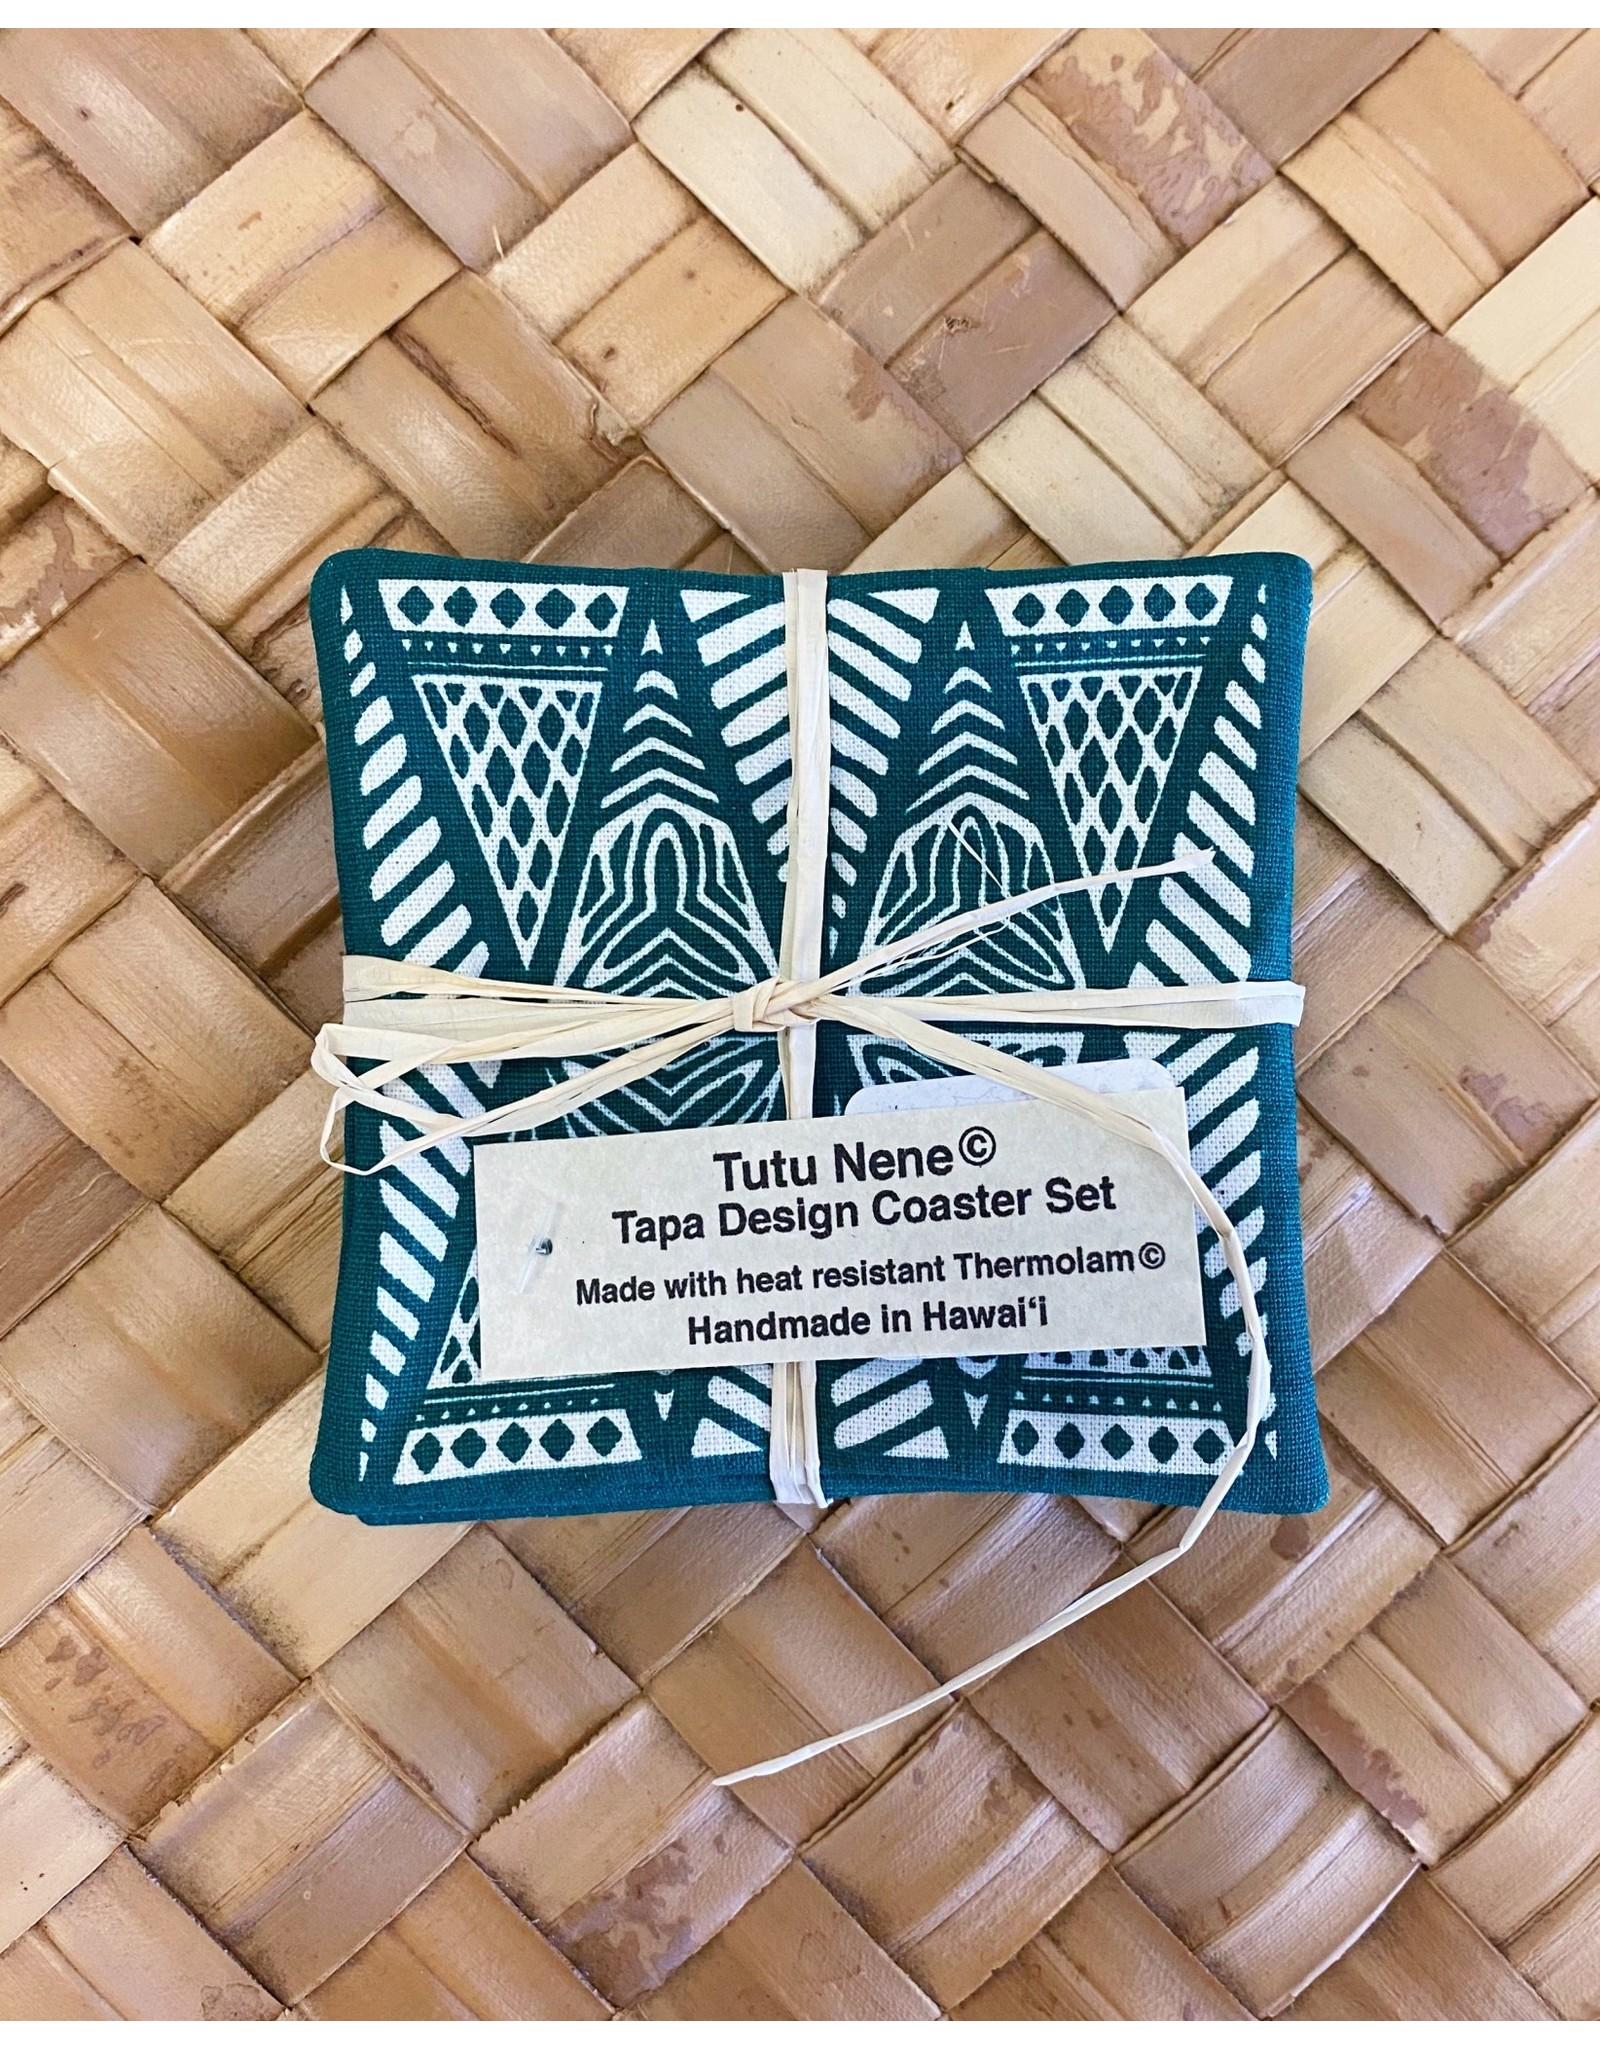 Tutu Nene Tutu Nene Coaster Set of 4